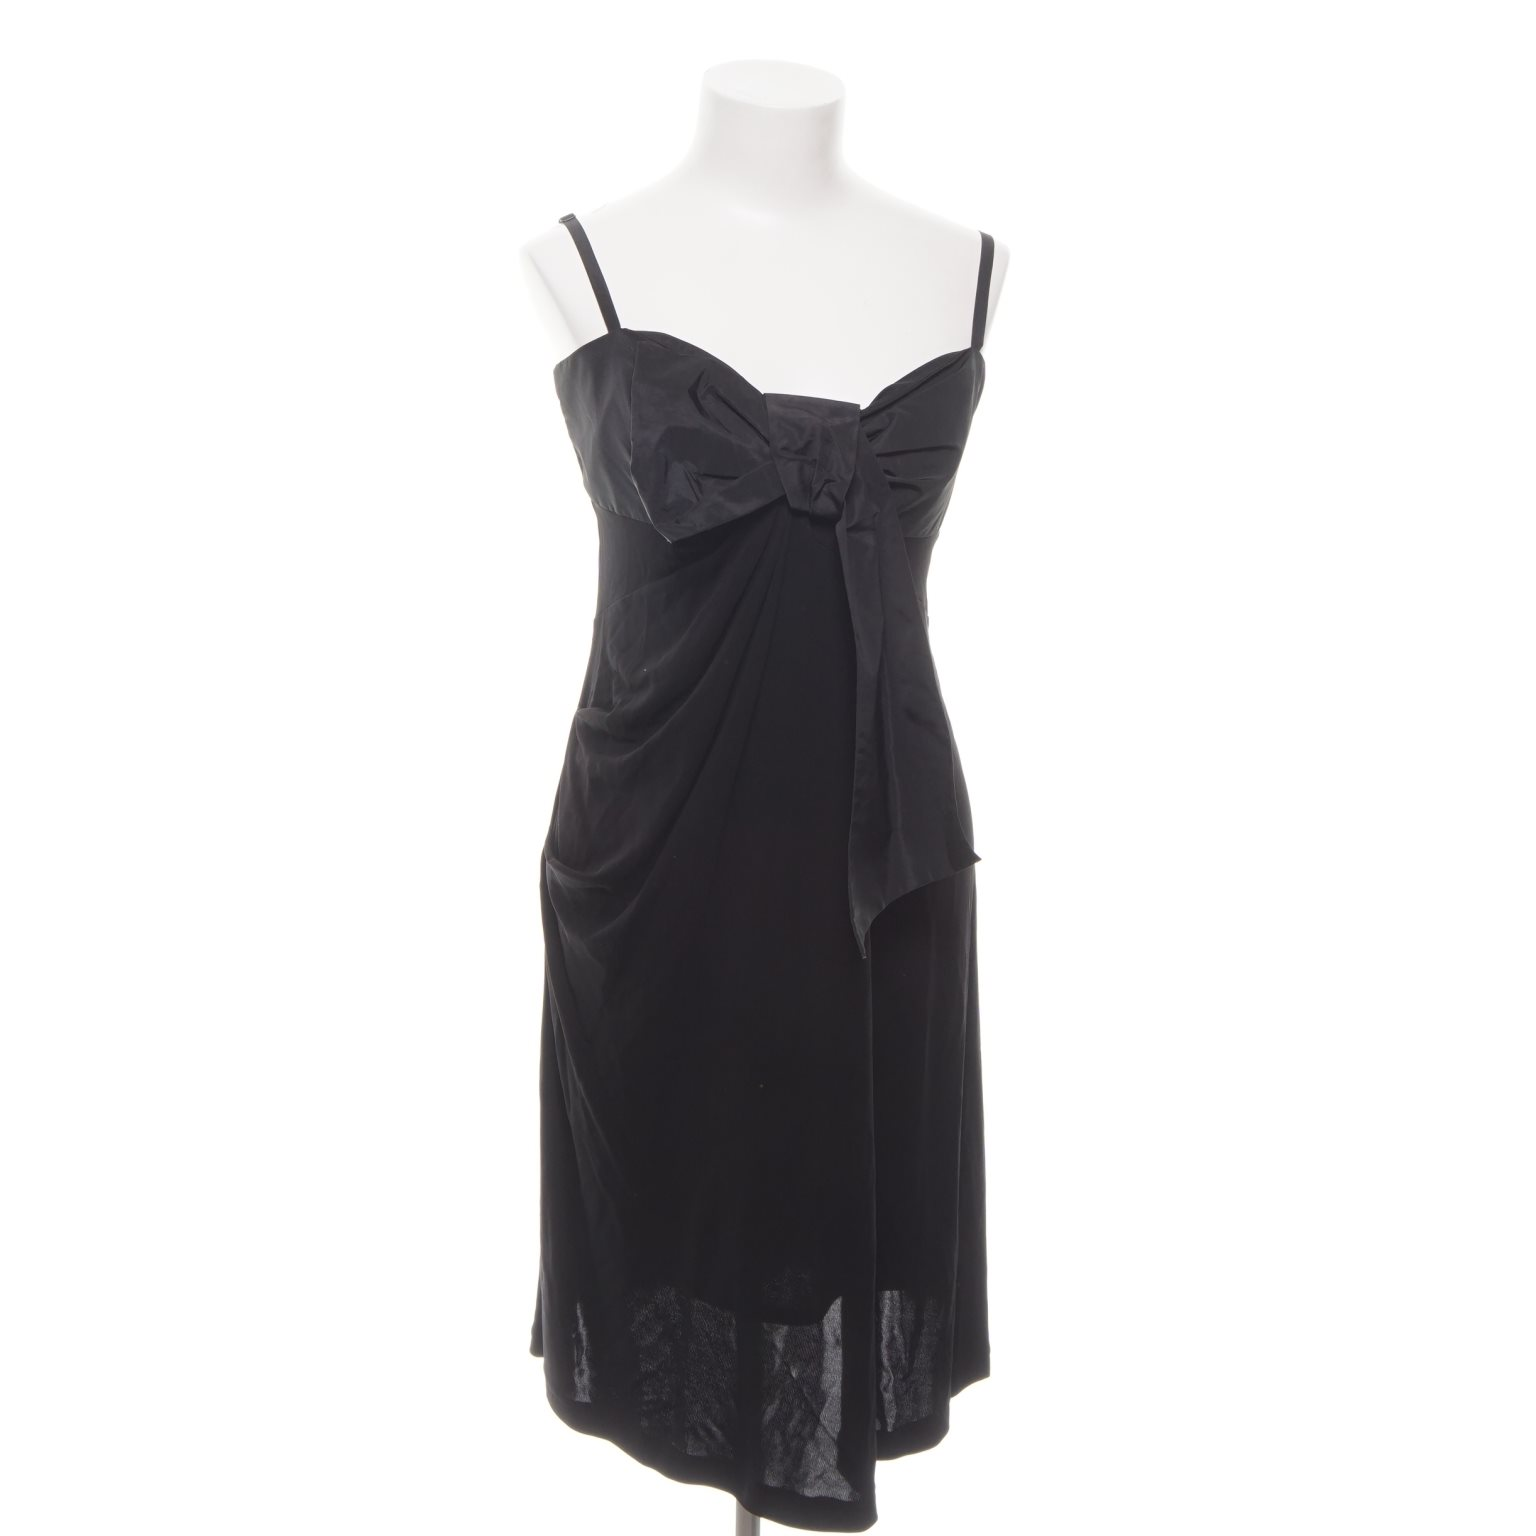 5b65b3fda551 Karen millen klänning